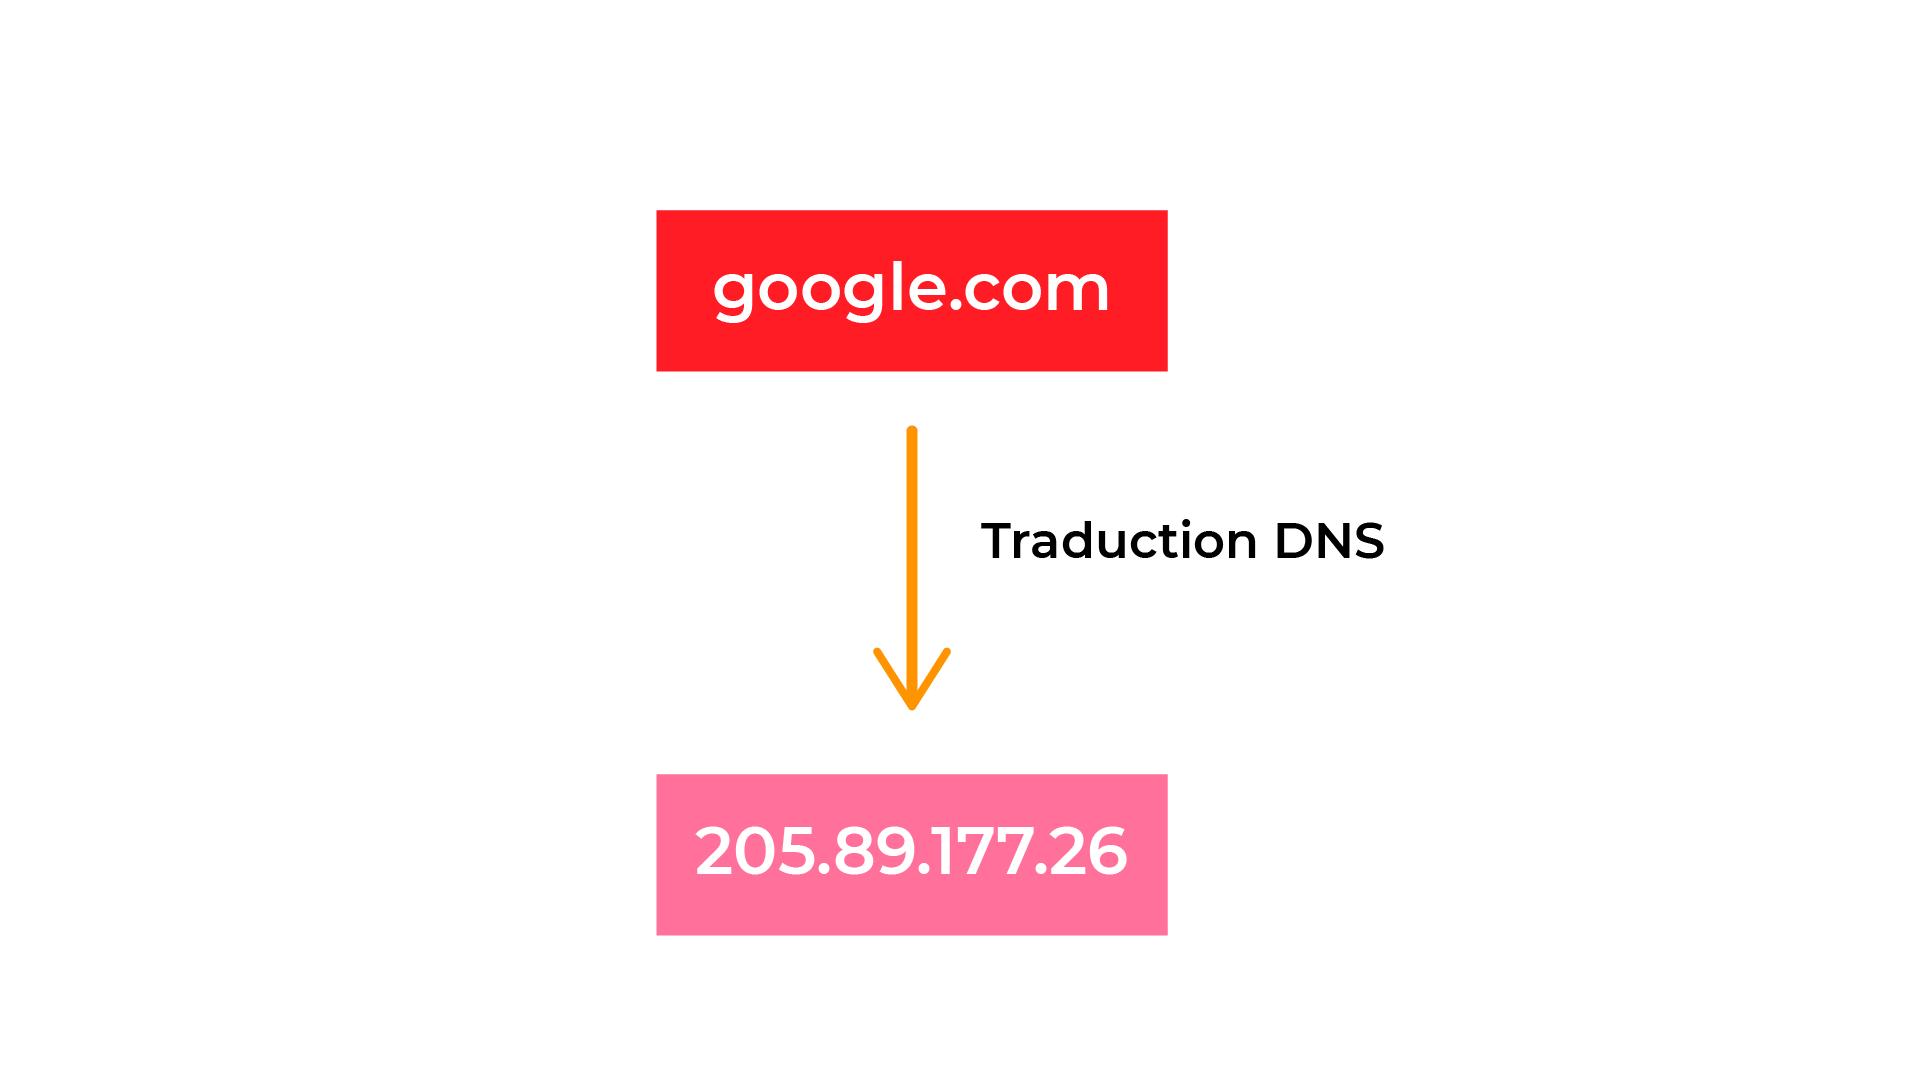 Le DNS permet de traduire le nom d'hôte en adresse IP.